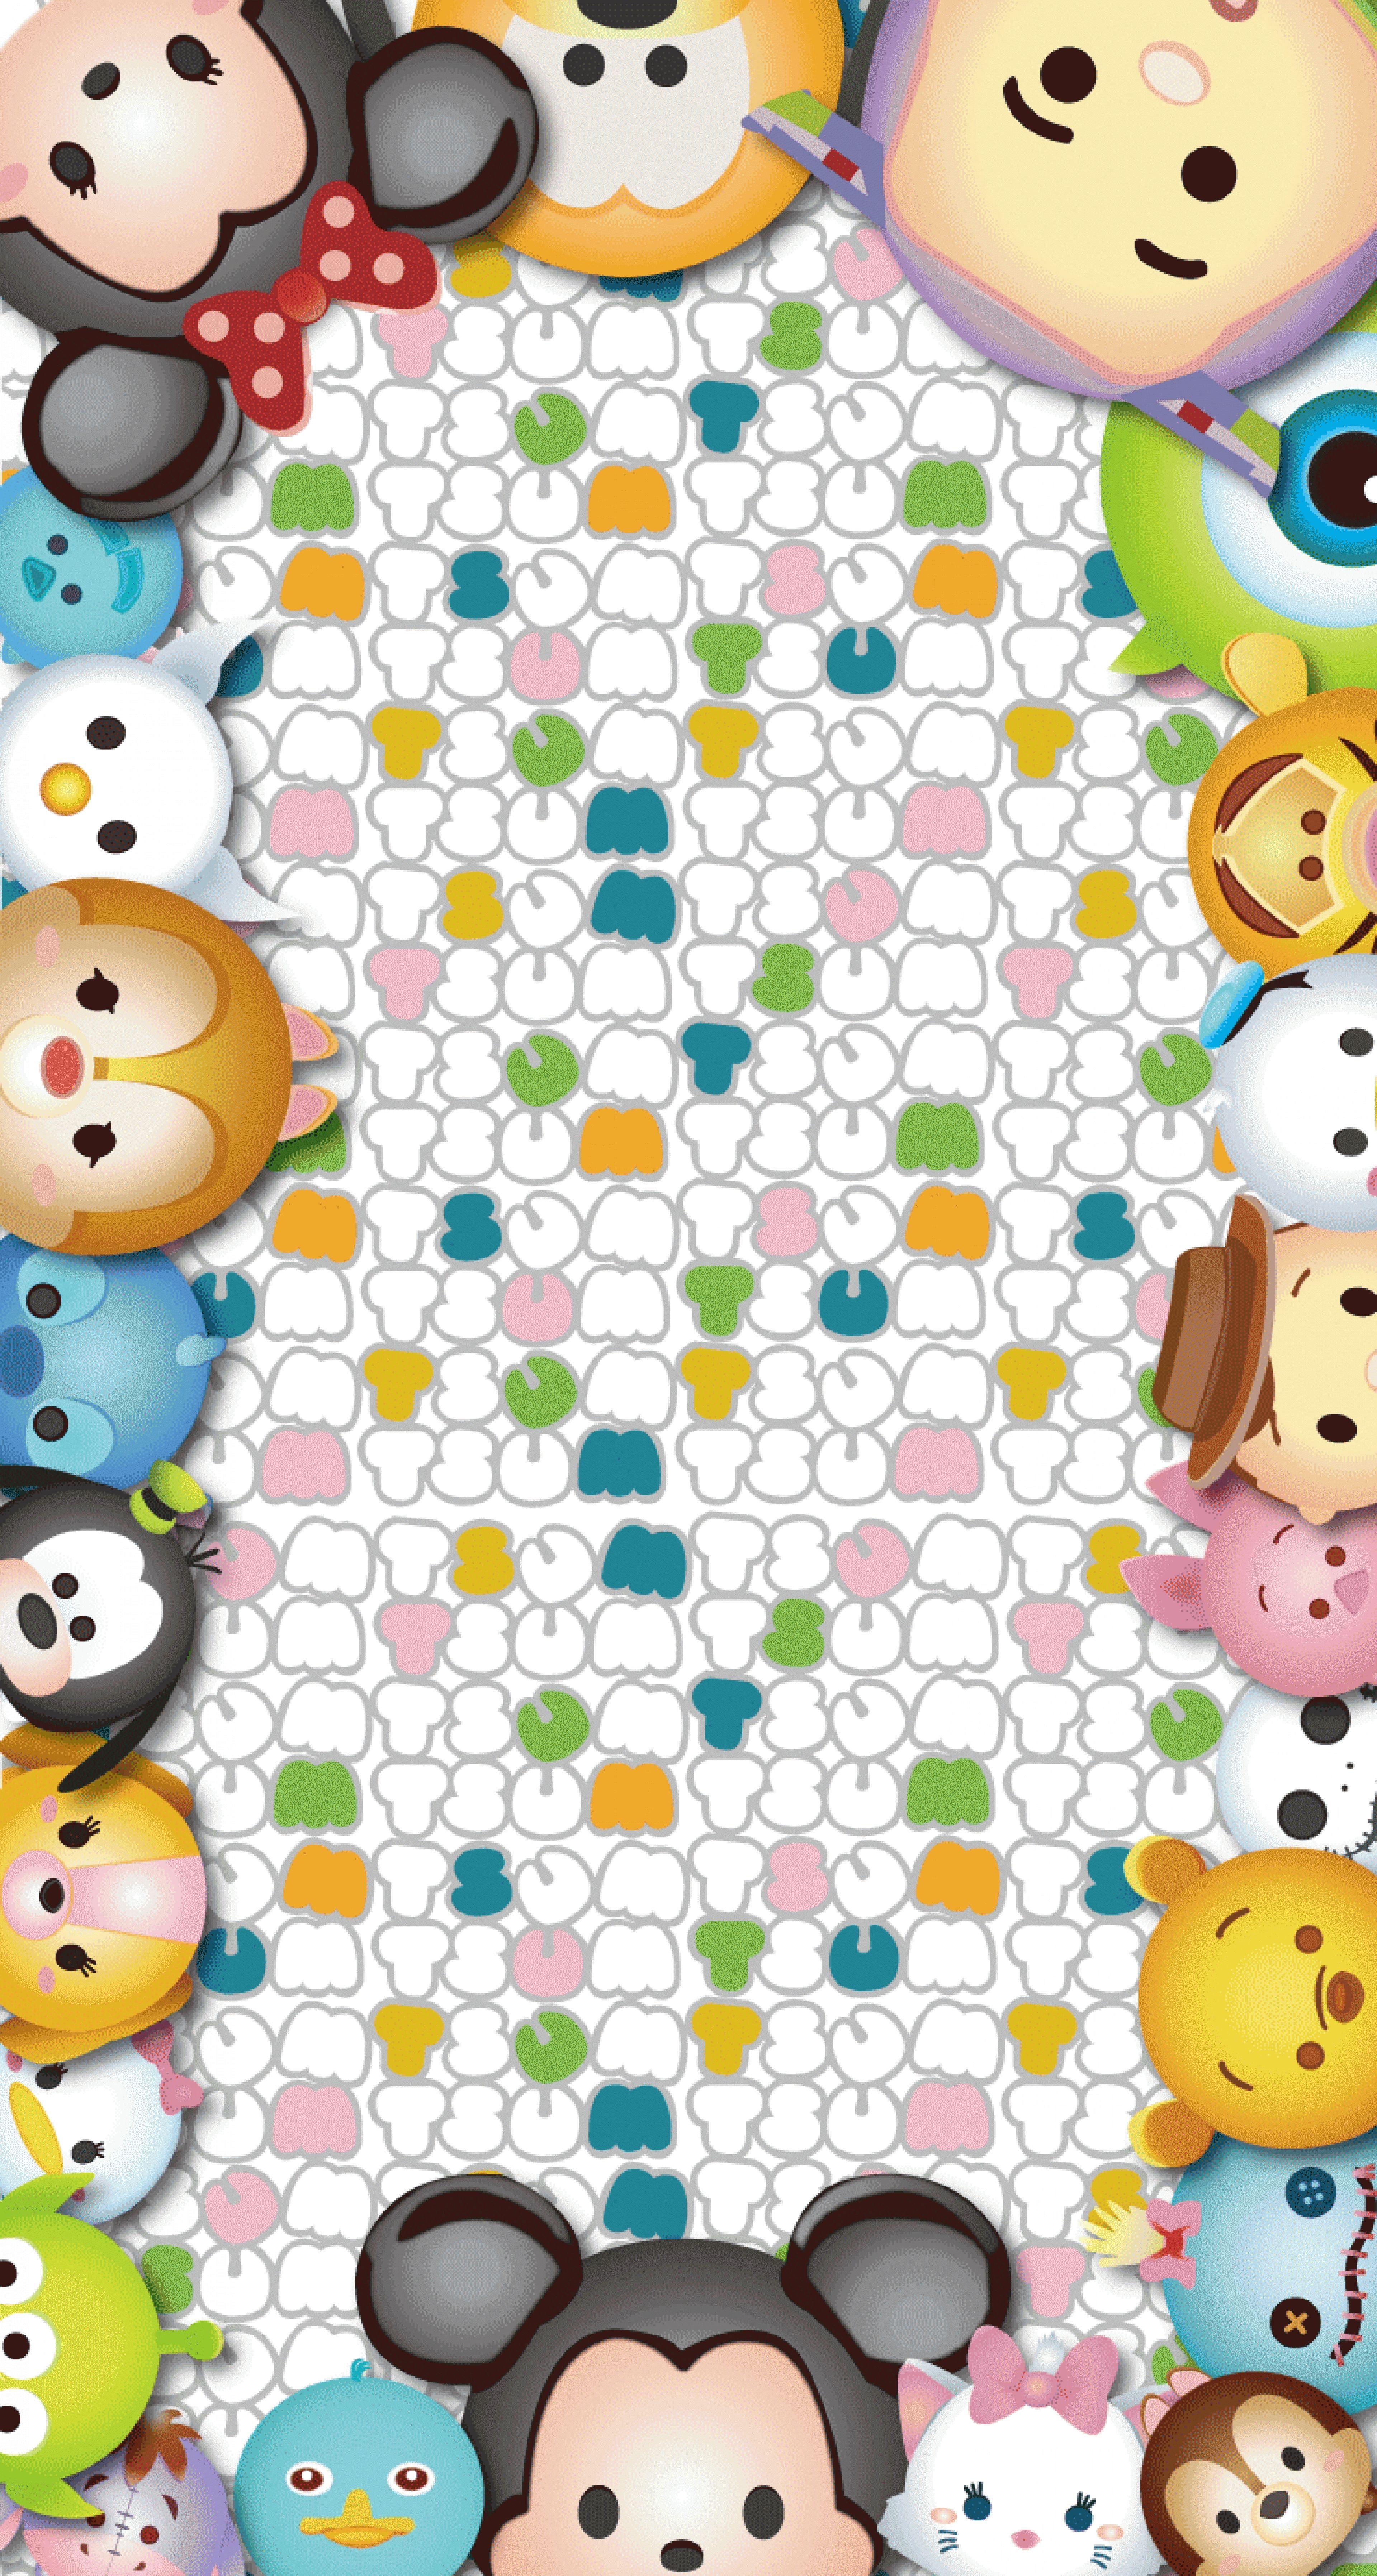 Pin On Tsum Tsum Wallpapers